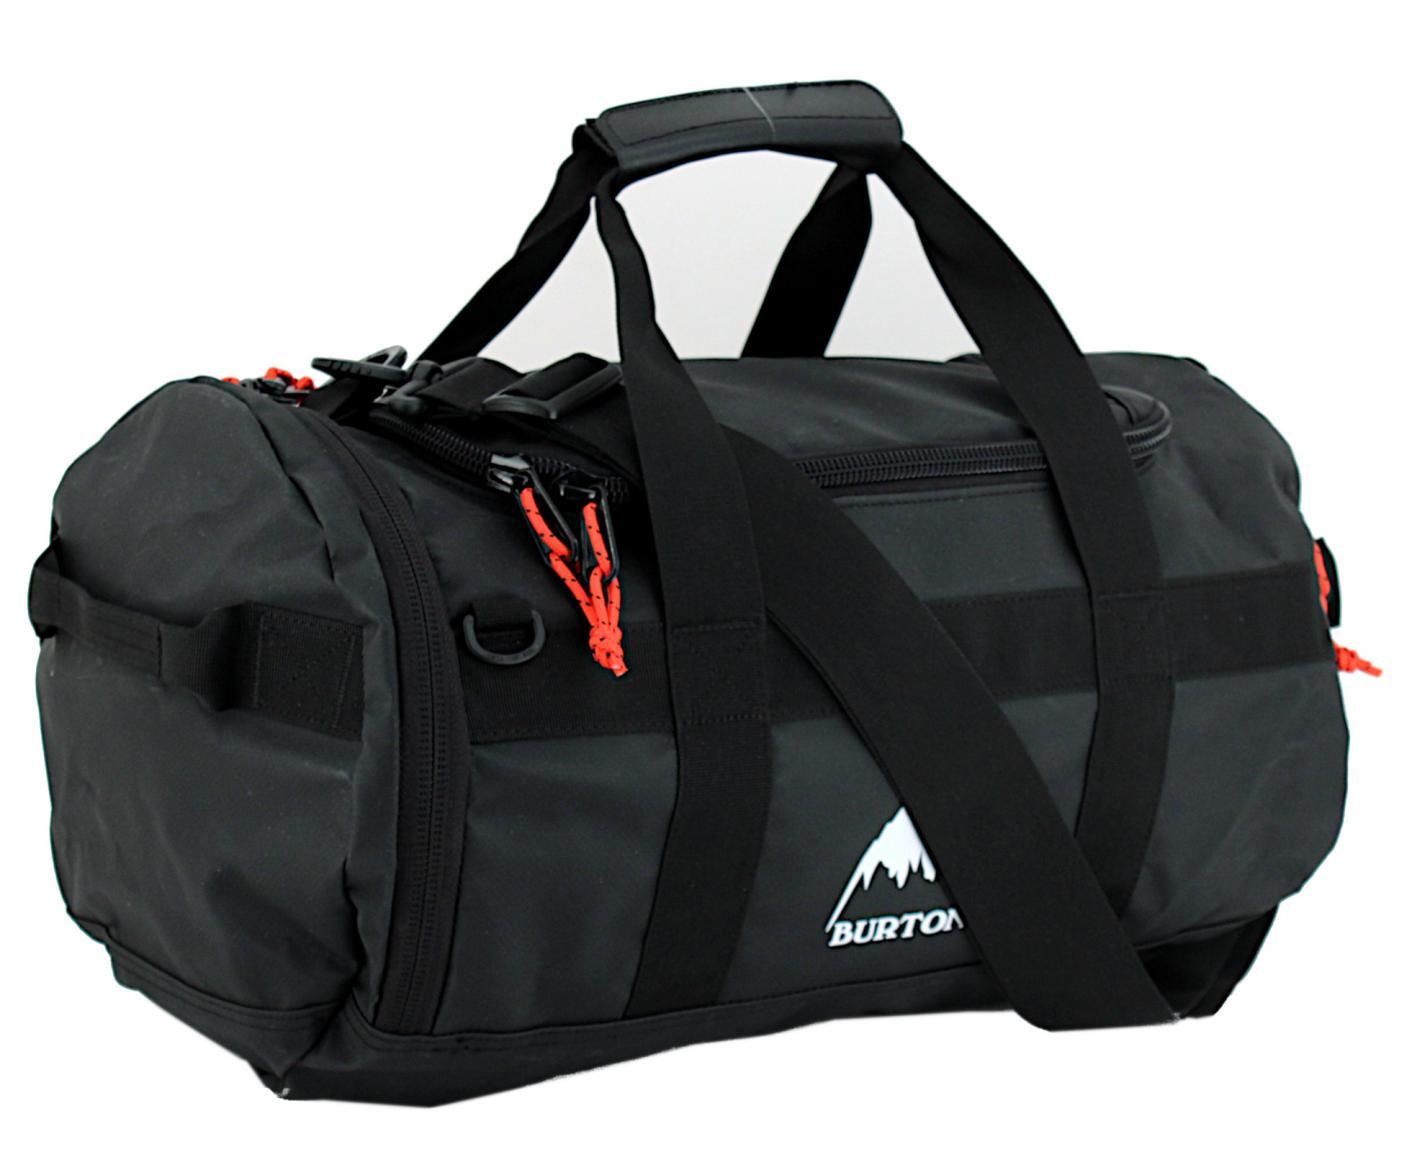 burton backhill duff xs sporttasche rucksack schwarz true black bags more. Black Bedroom Furniture Sets. Home Design Ideas